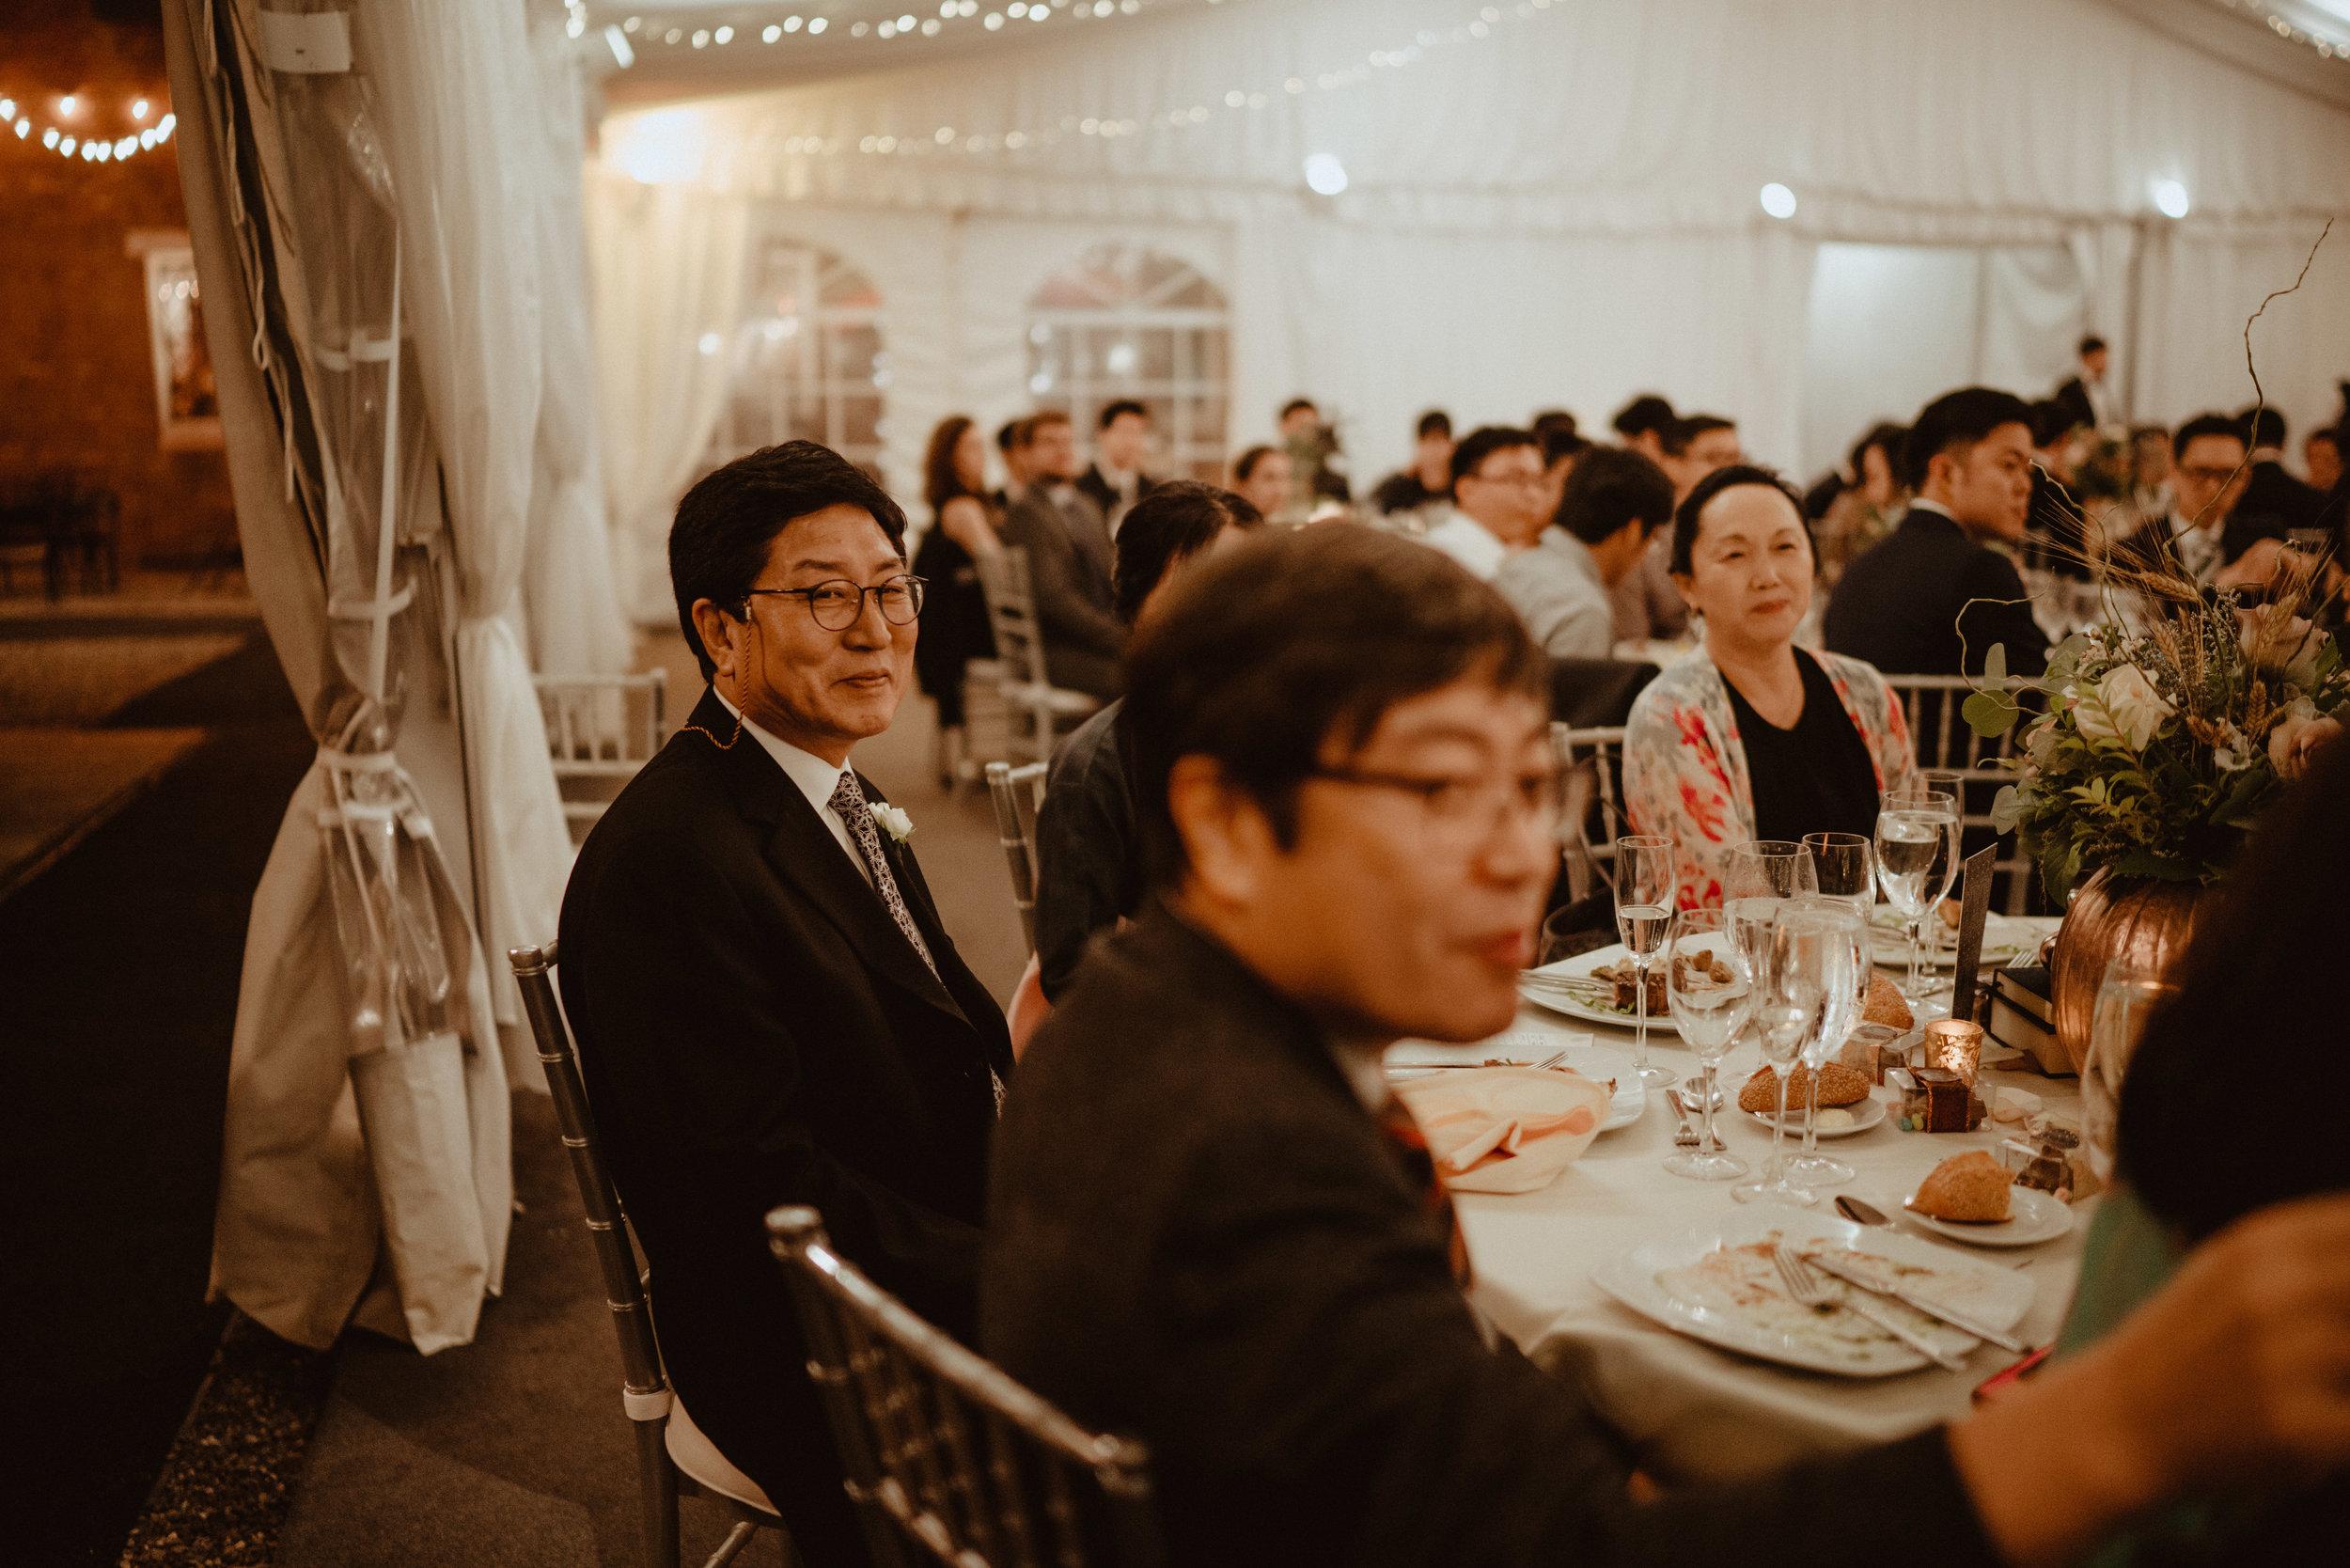 Irene-and-Jae-2019_Brooklyn_Wedding_Photographer_Chellise_Michael_Photography--121.jpg